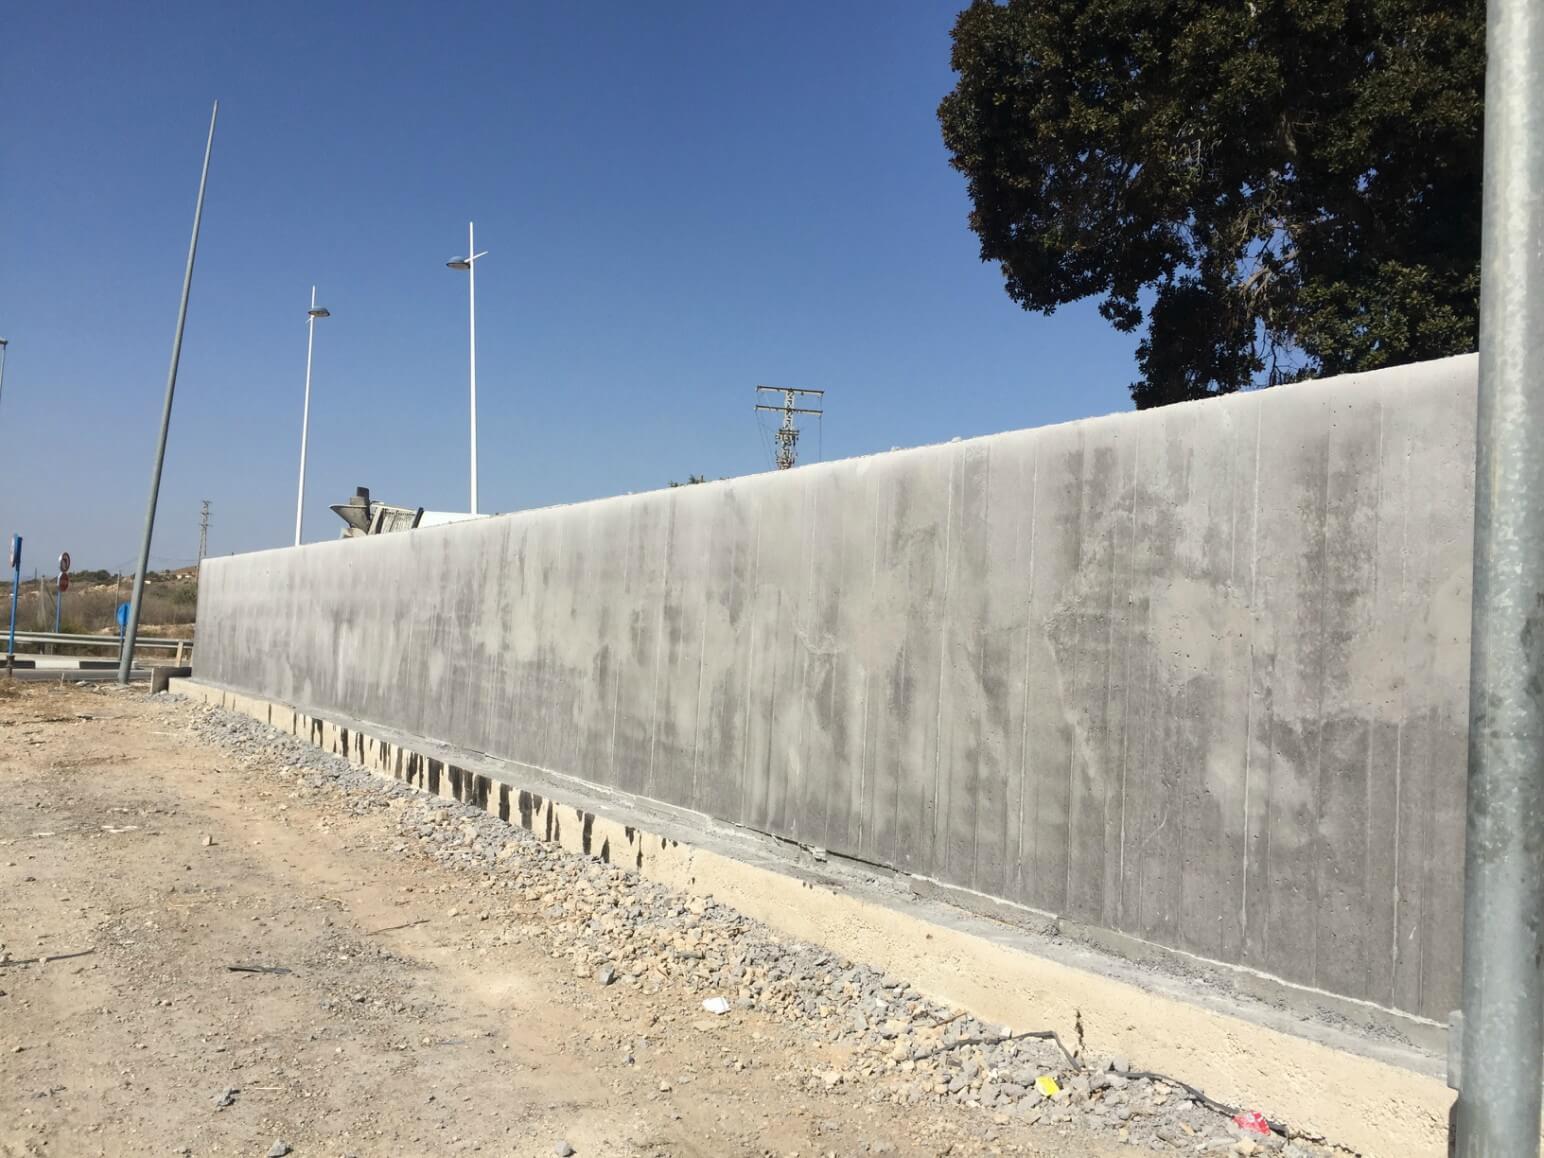 proyecto muro perimetral encofrados de aluminio construccion strong forms alicante 17